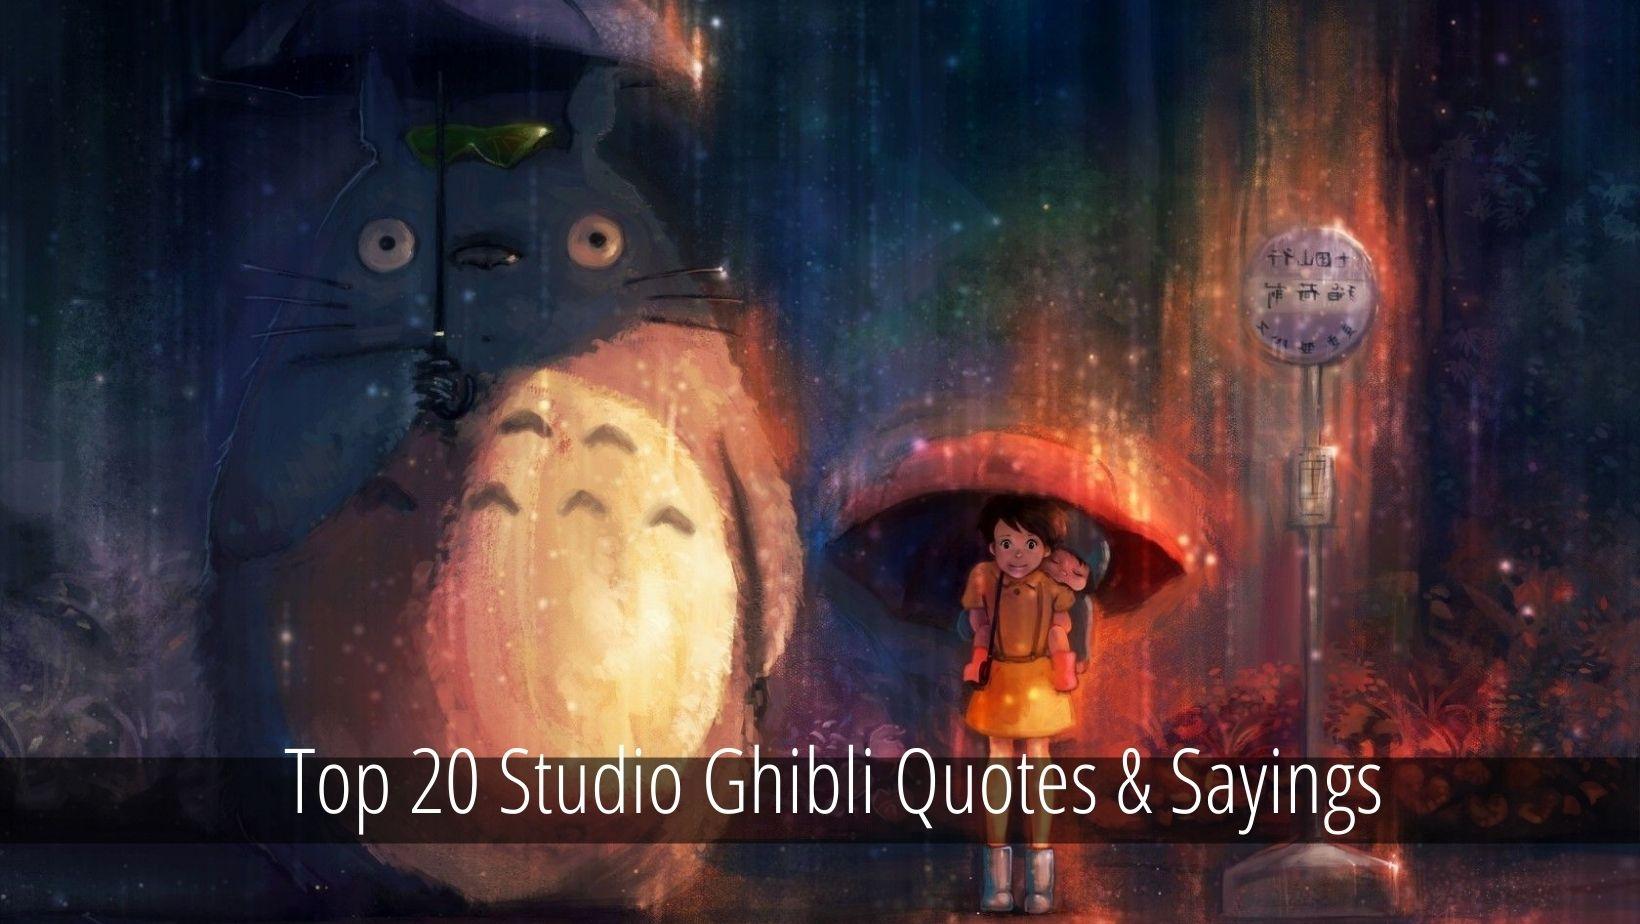 Stuido Ghibli Quotes